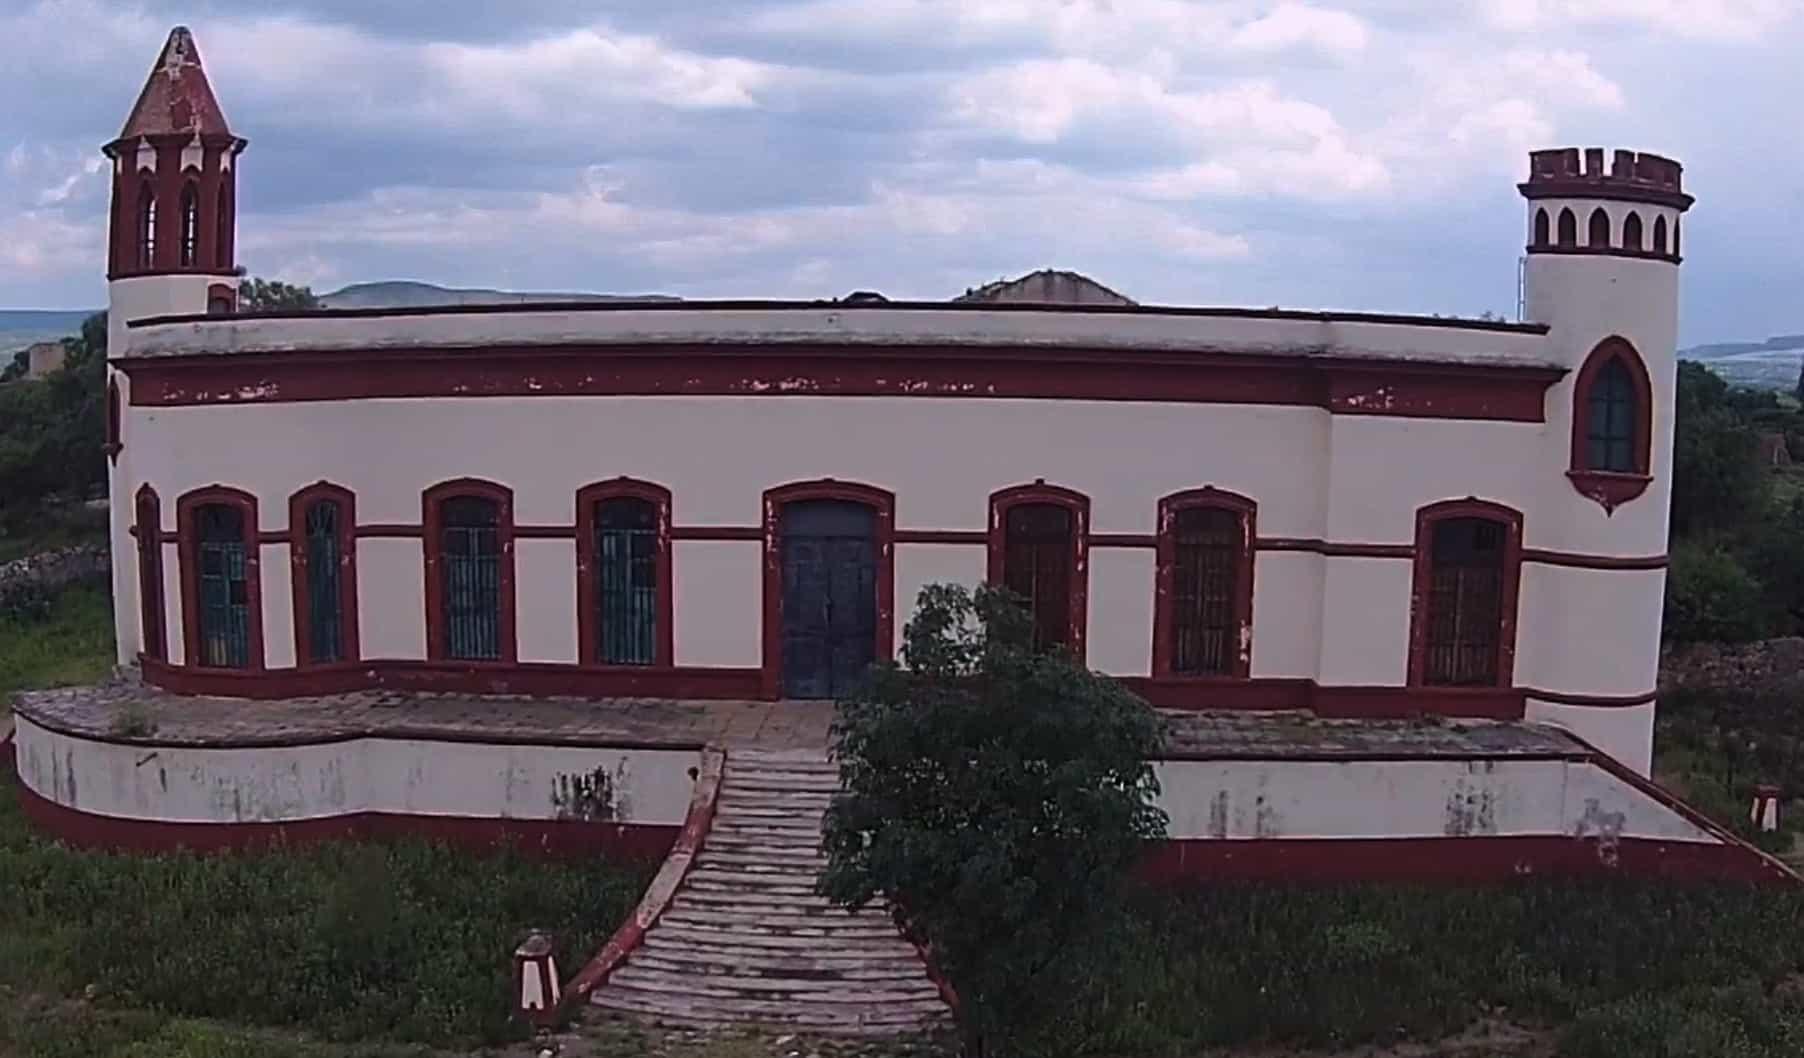 Mineral de Pozos, Ex hacienda in Guanajuato, #MineraldePozos